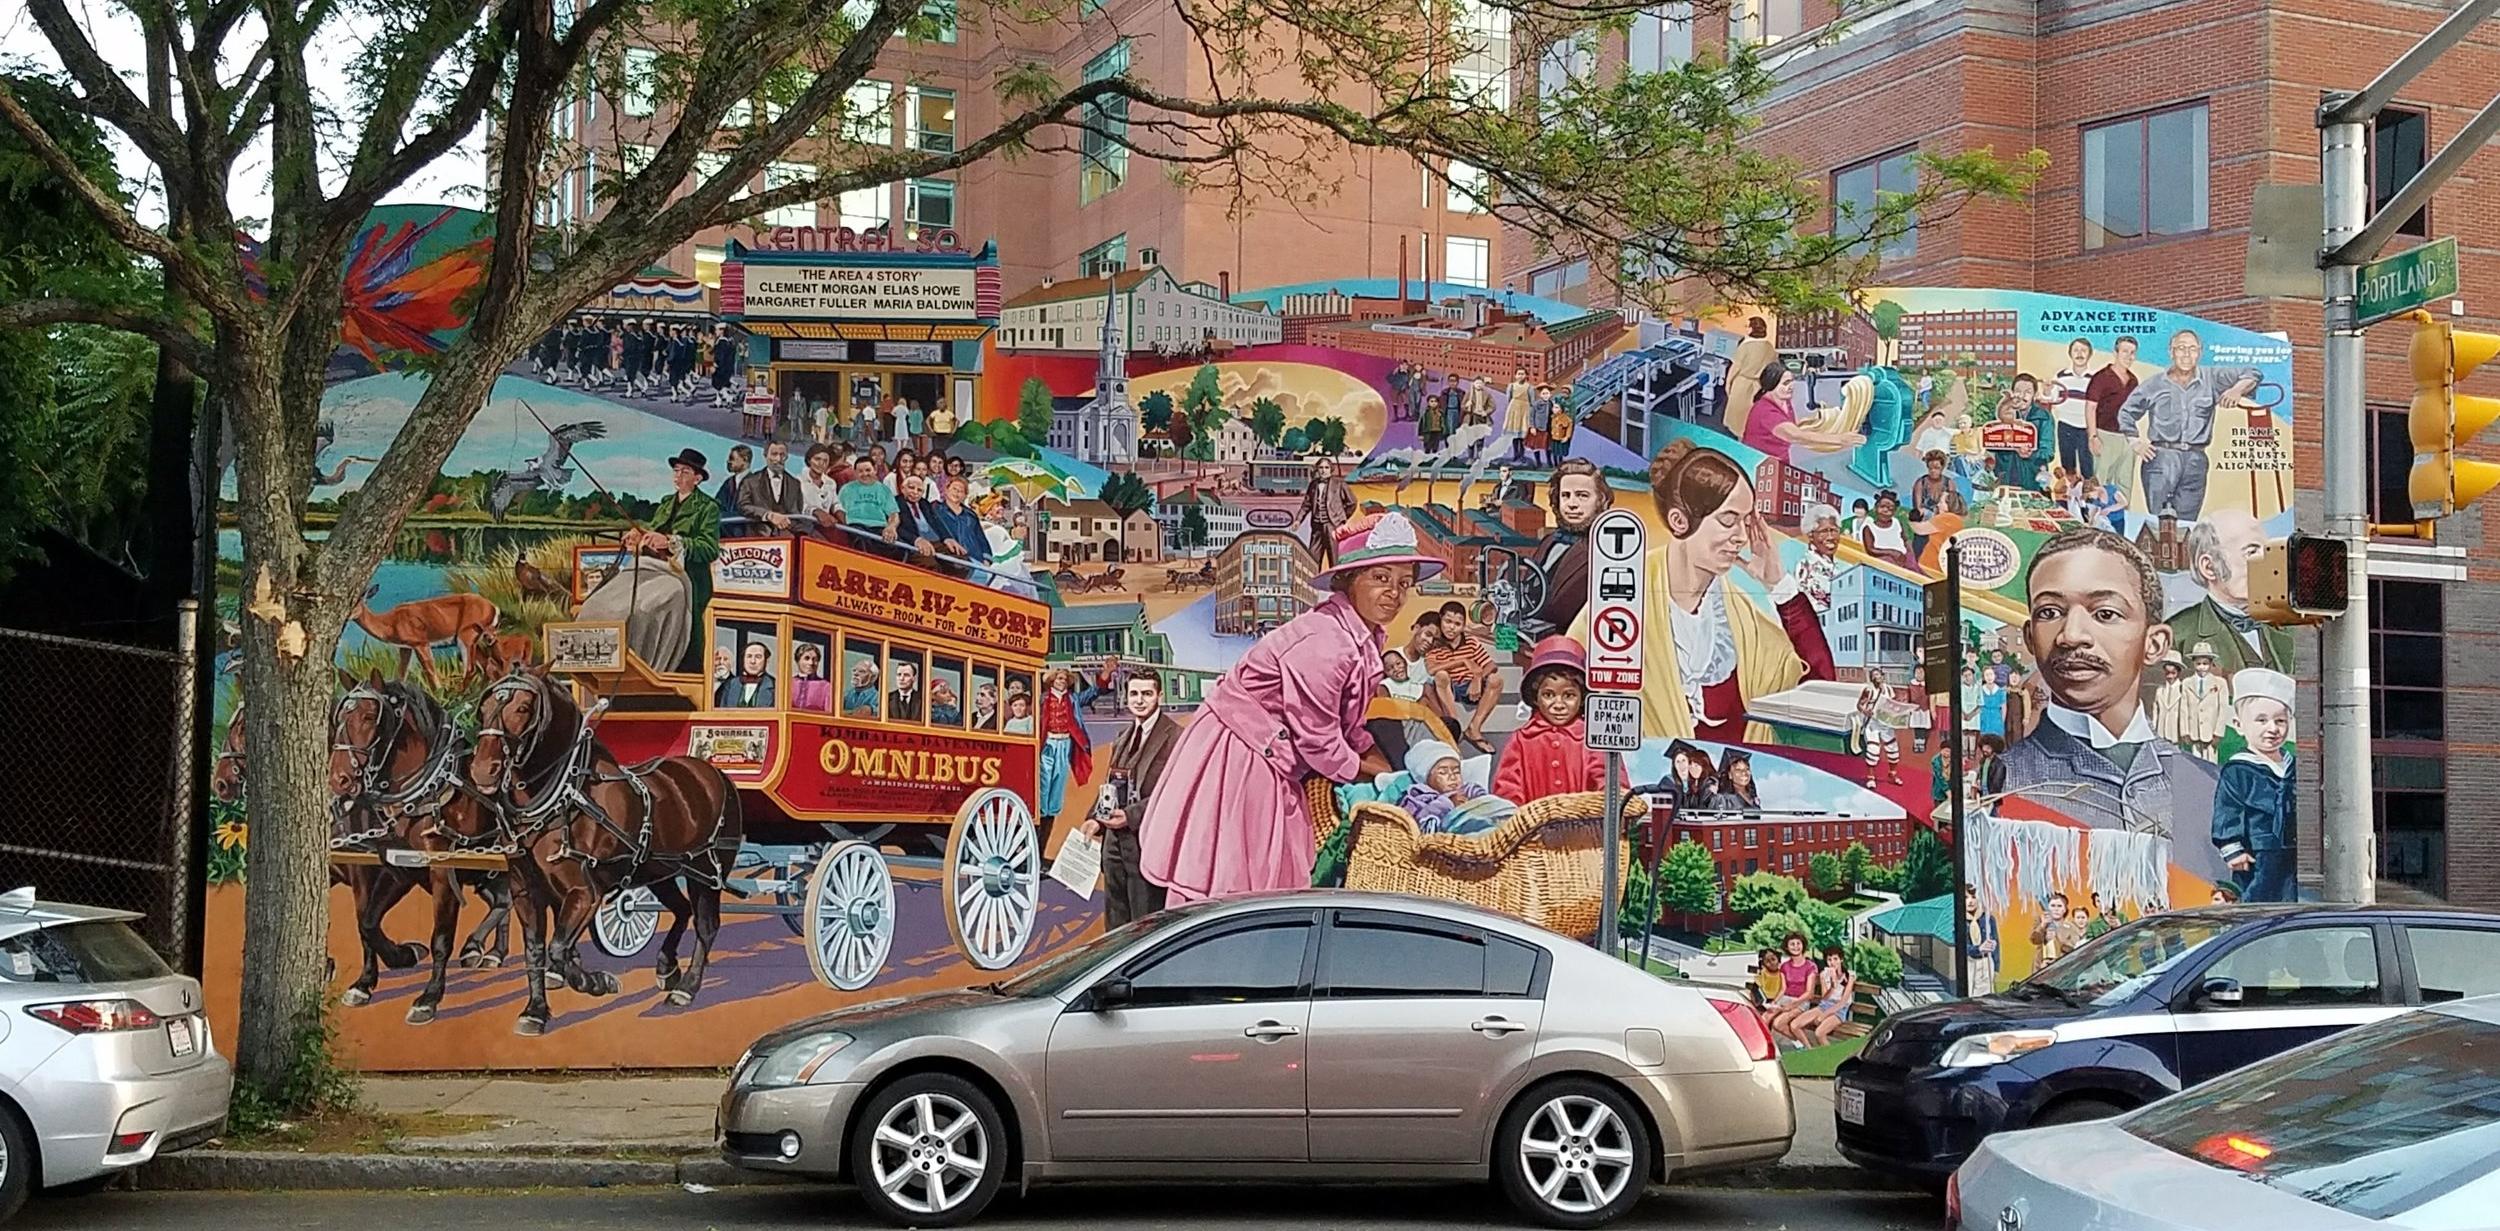 Street art in Cambridge, MA.